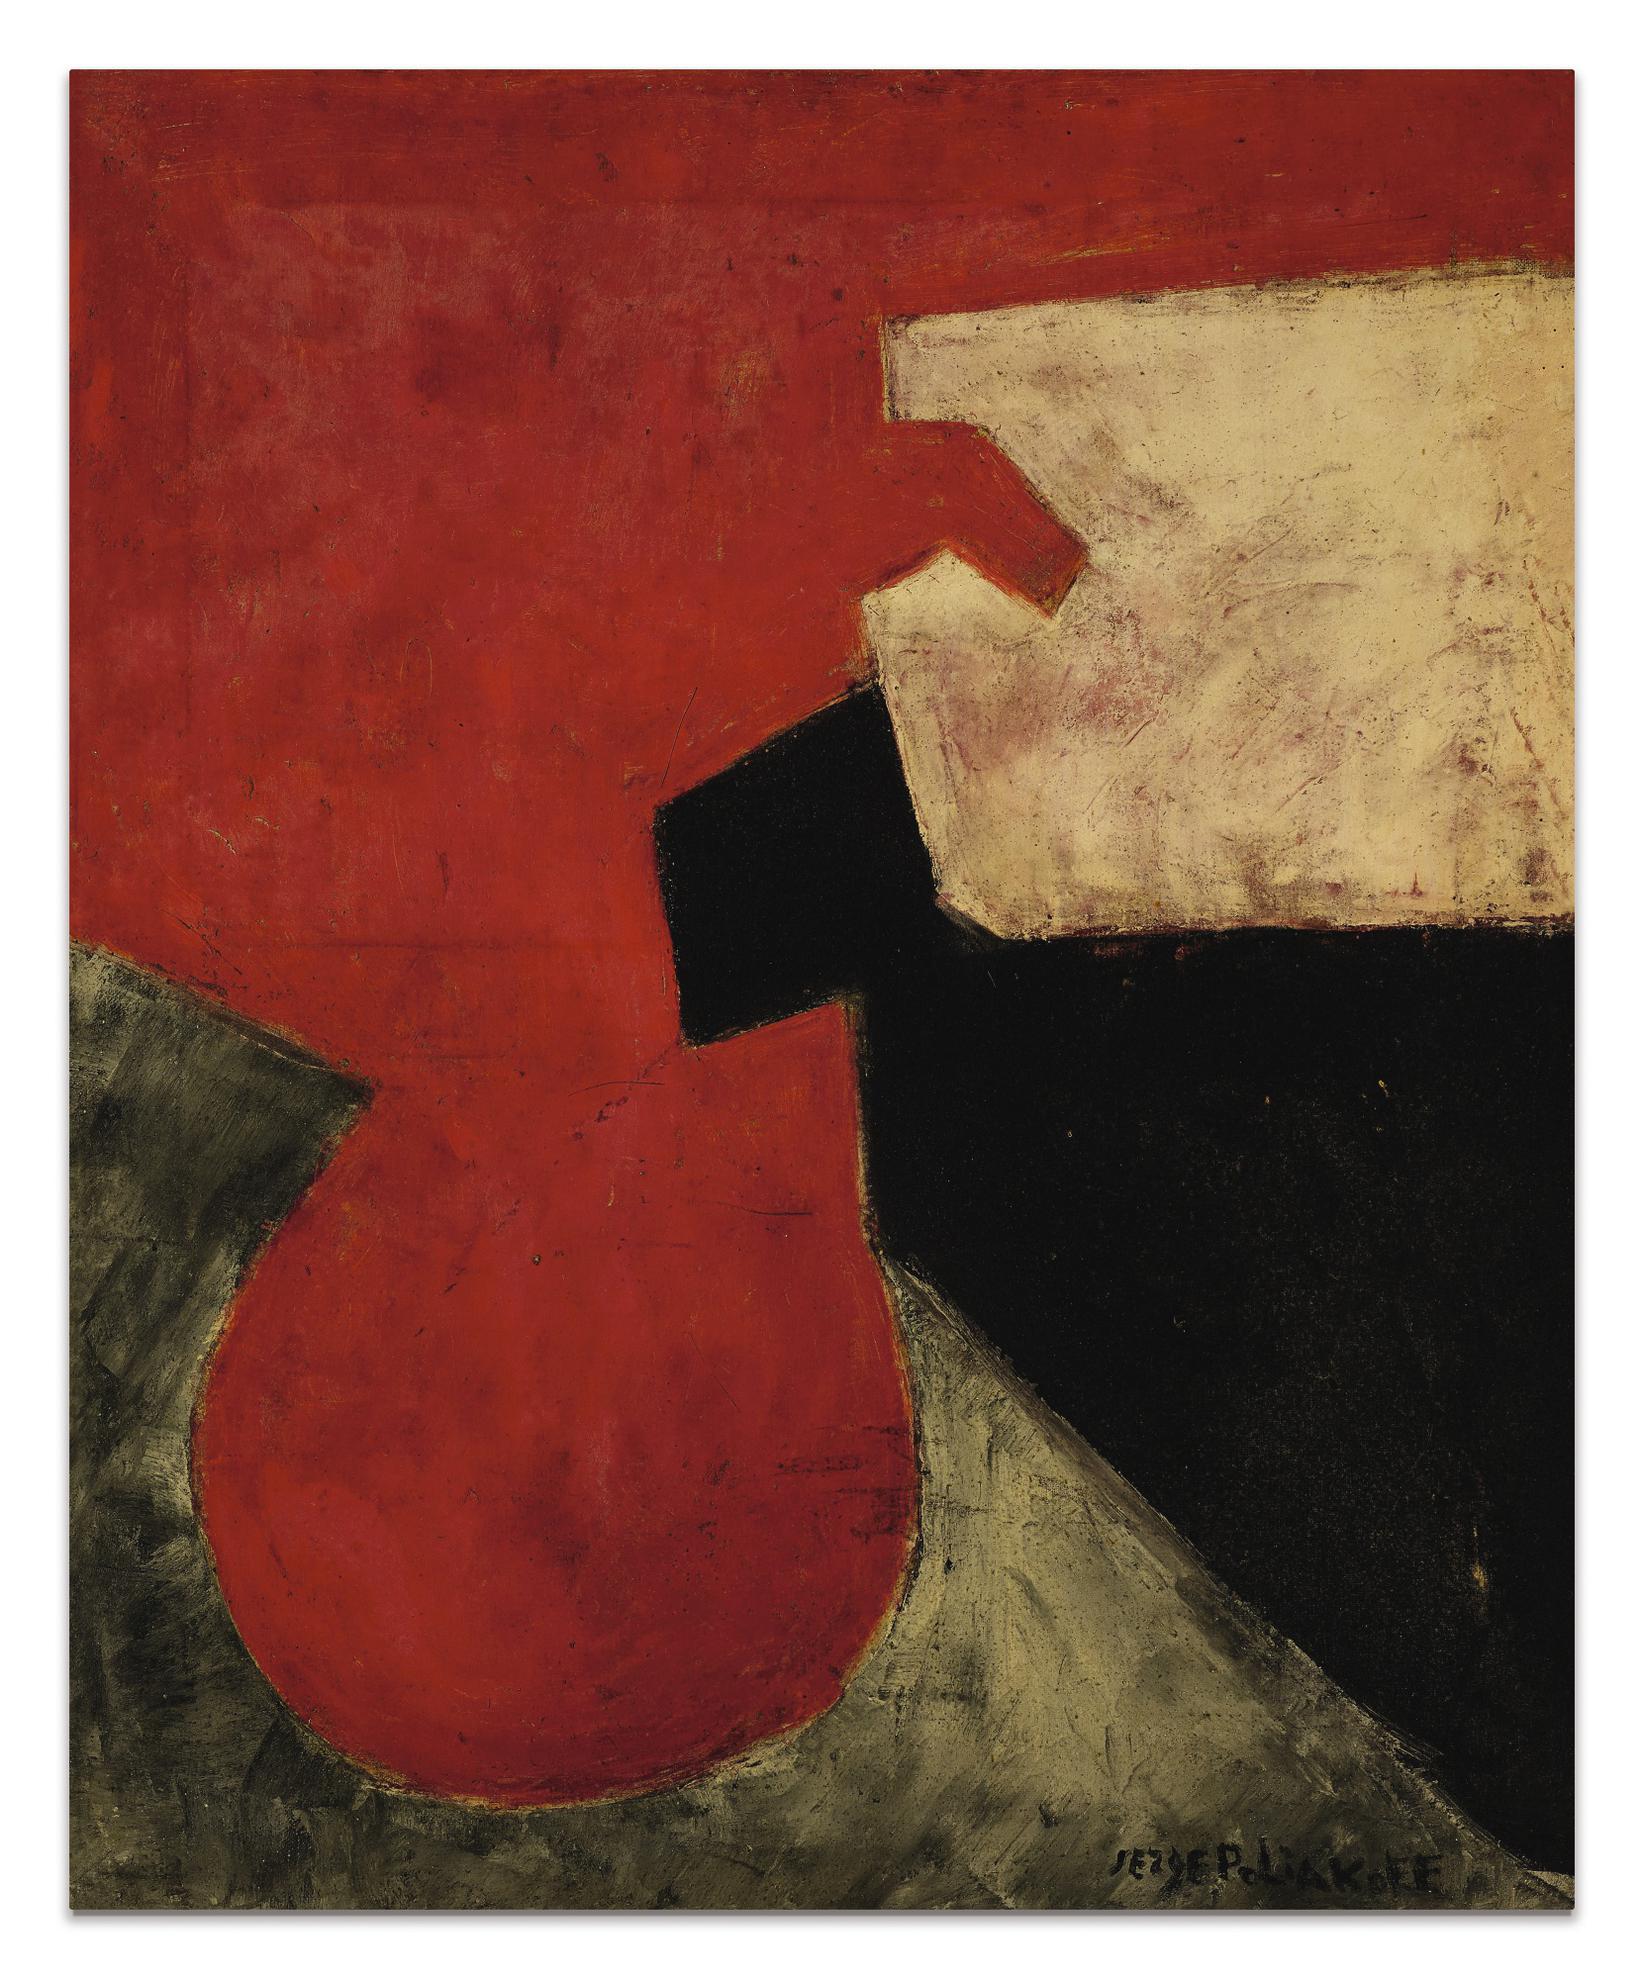 Serge Poliakoff-Composition Abstraite-1960